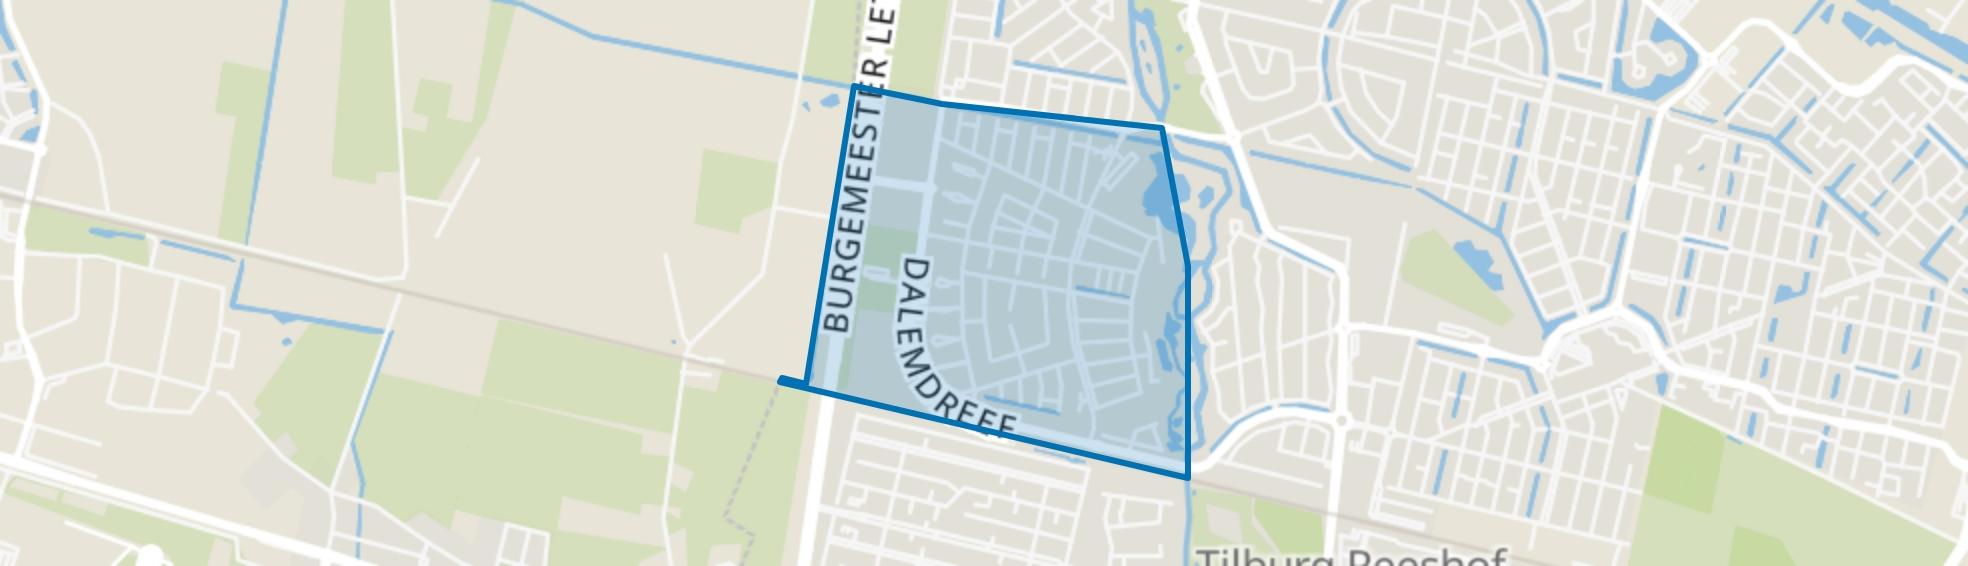 Dalem Zuid, Tilburg map